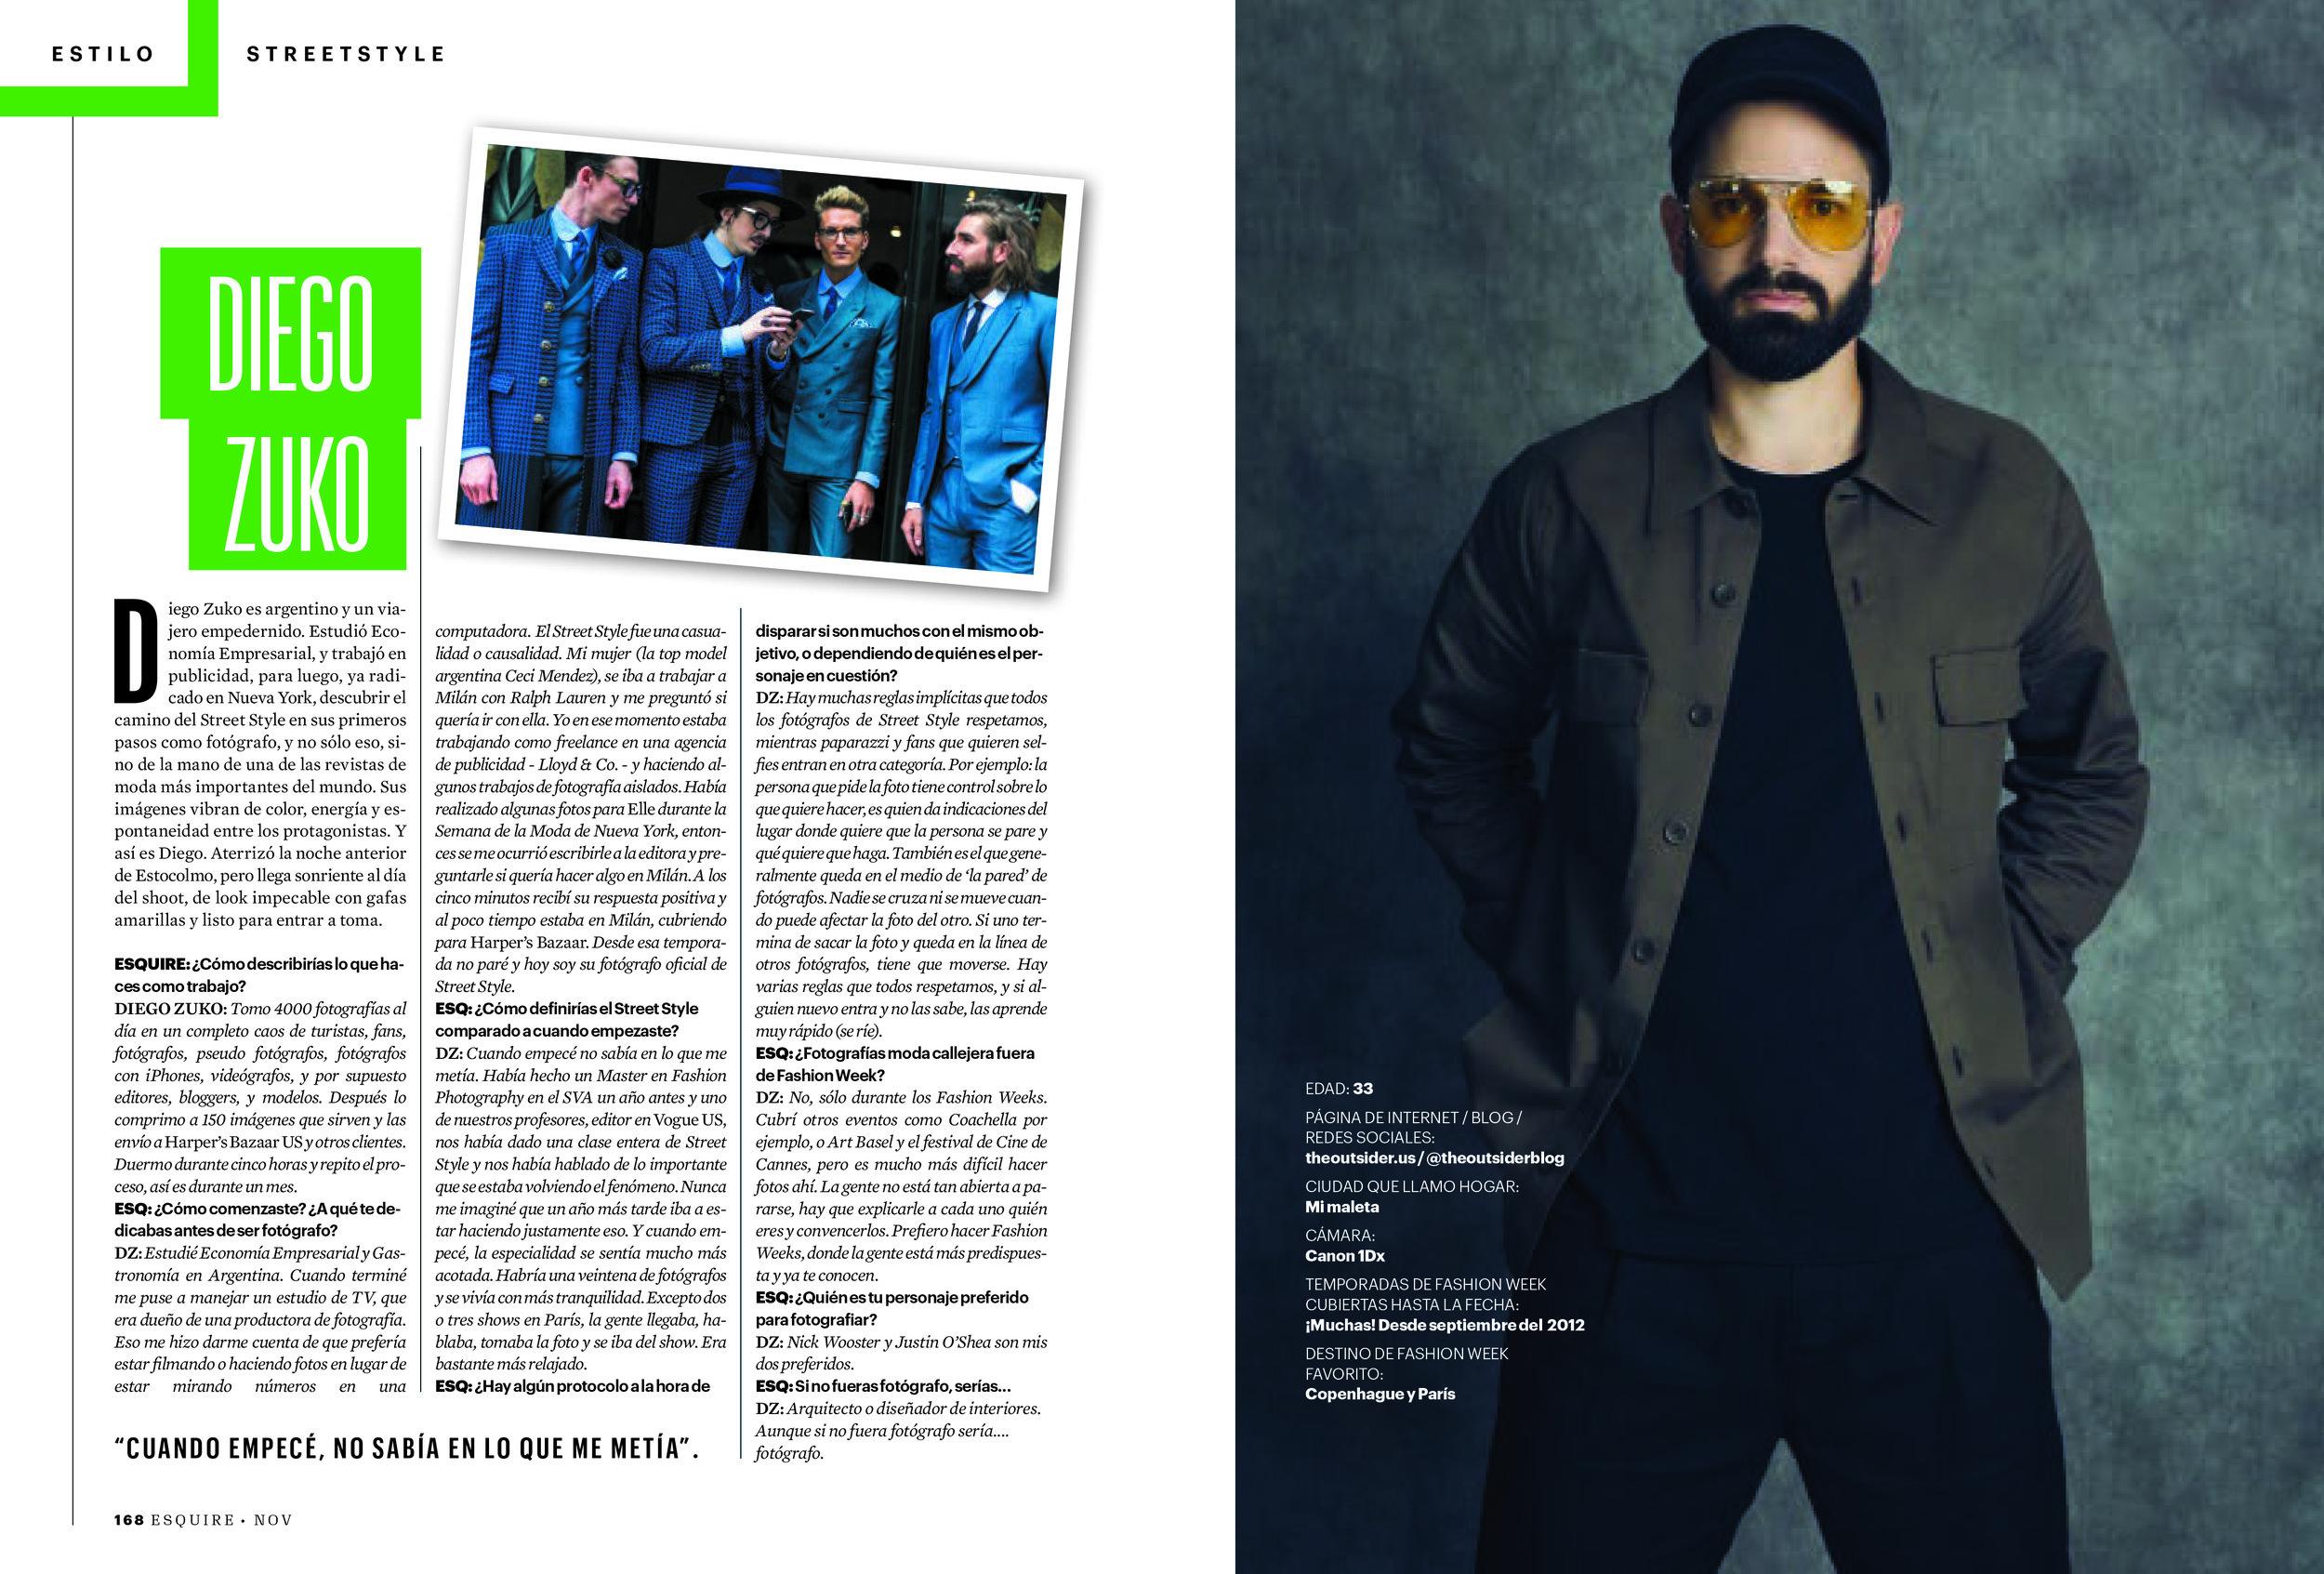 Diego Zuko's interview forEsquire Mexico -